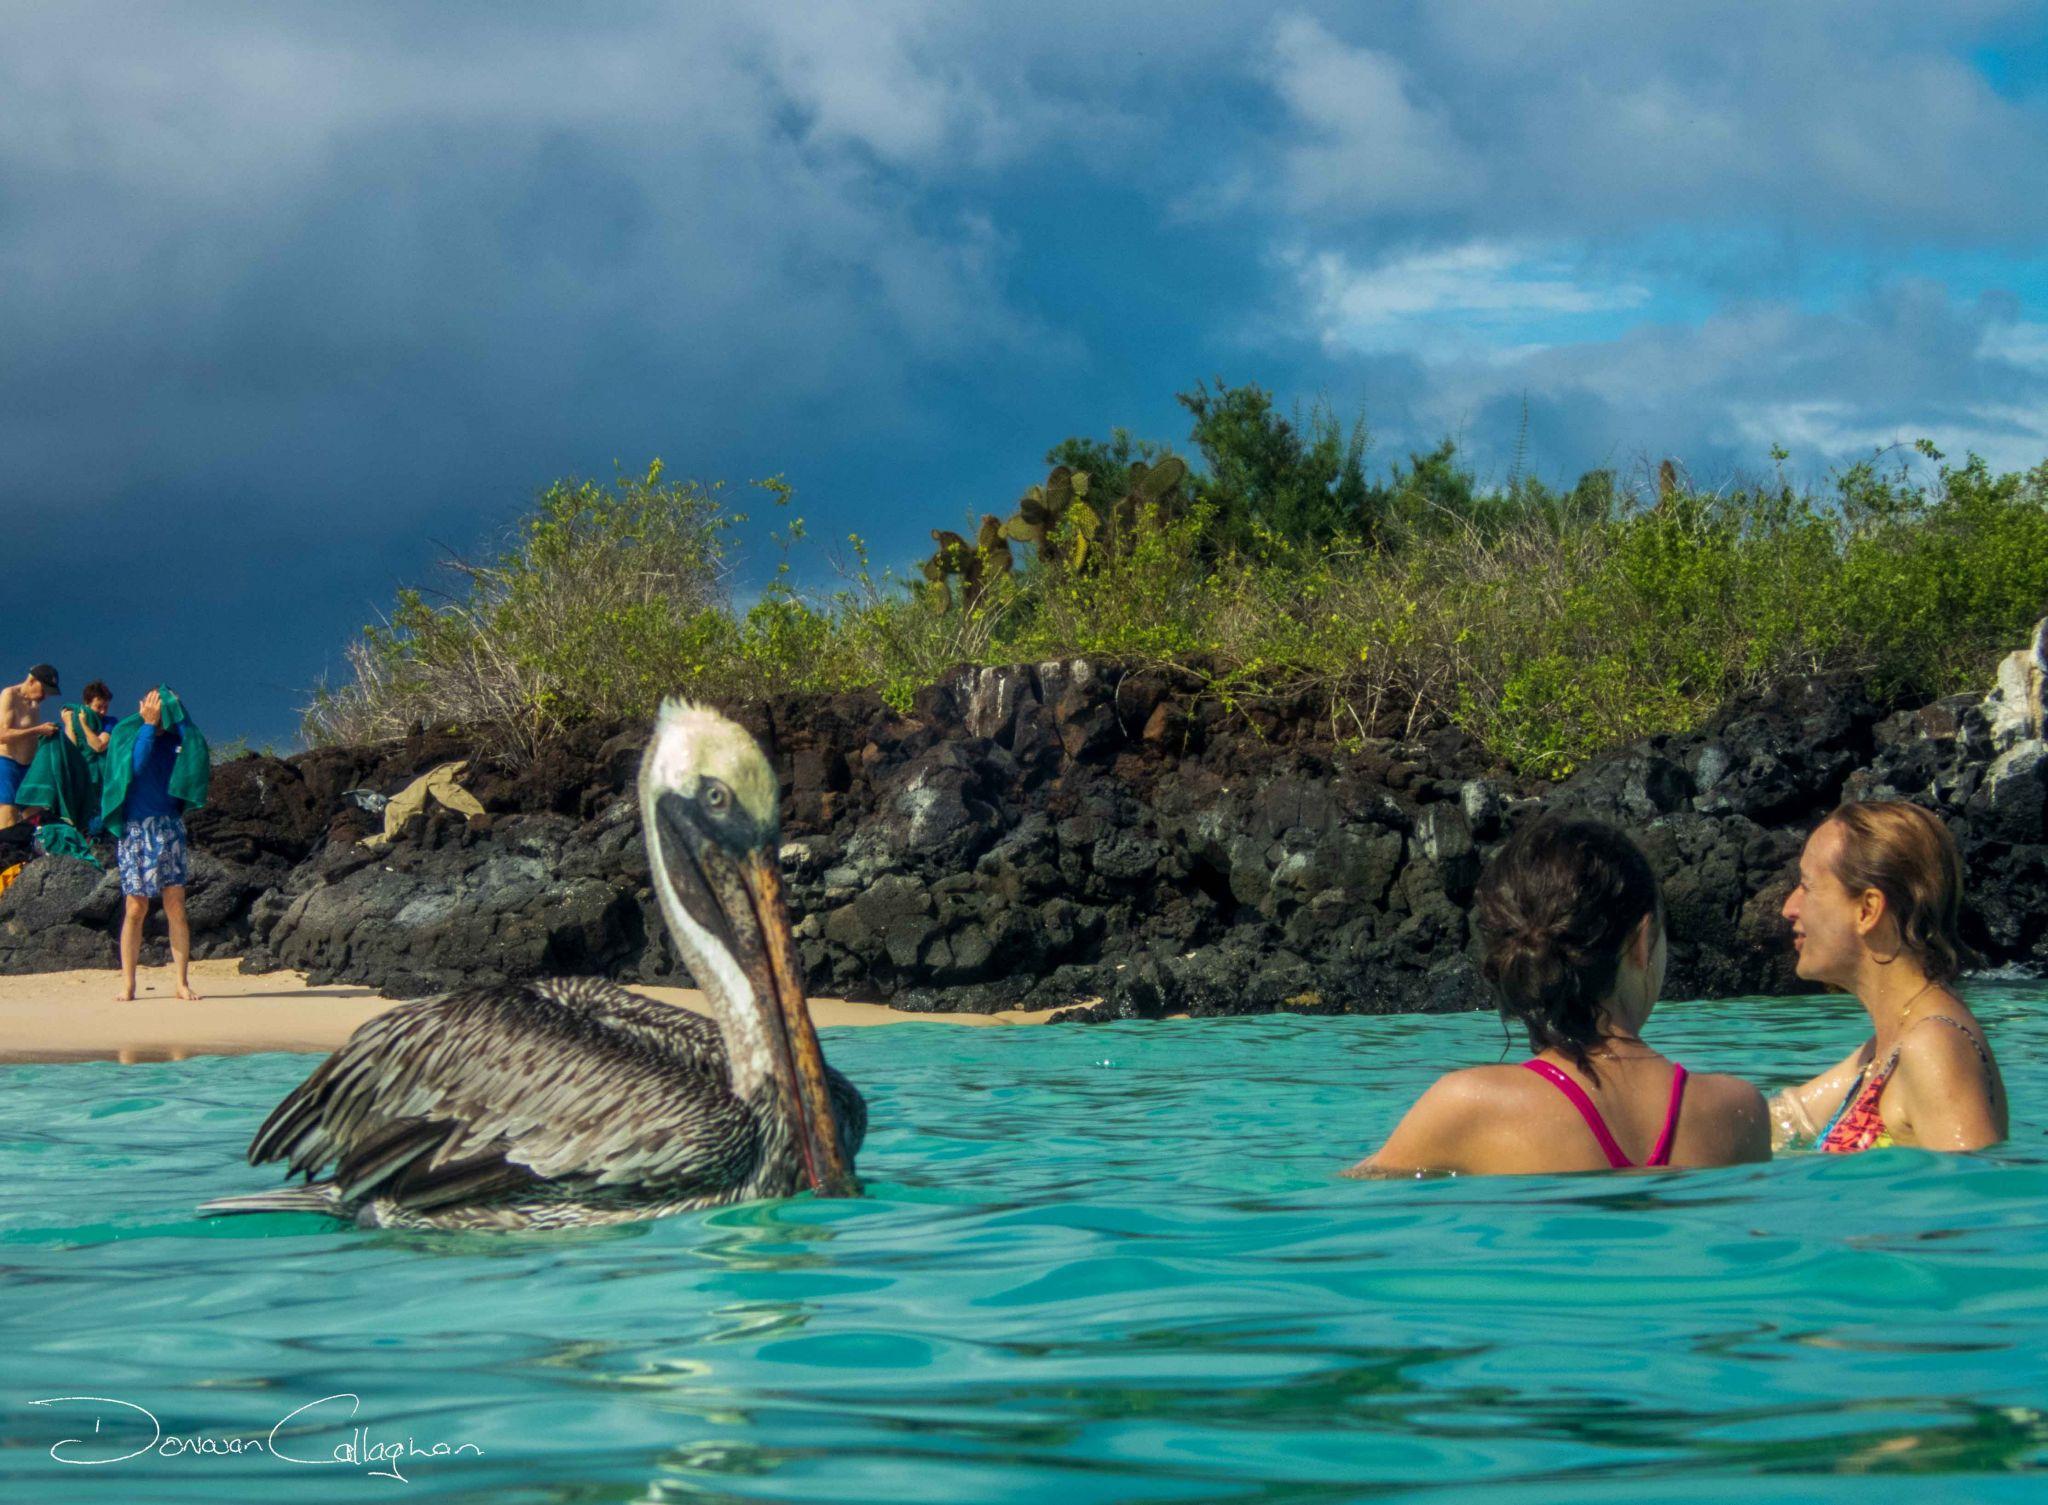 Swimming with wild Pelicans Galapagos Islands, Ecuador